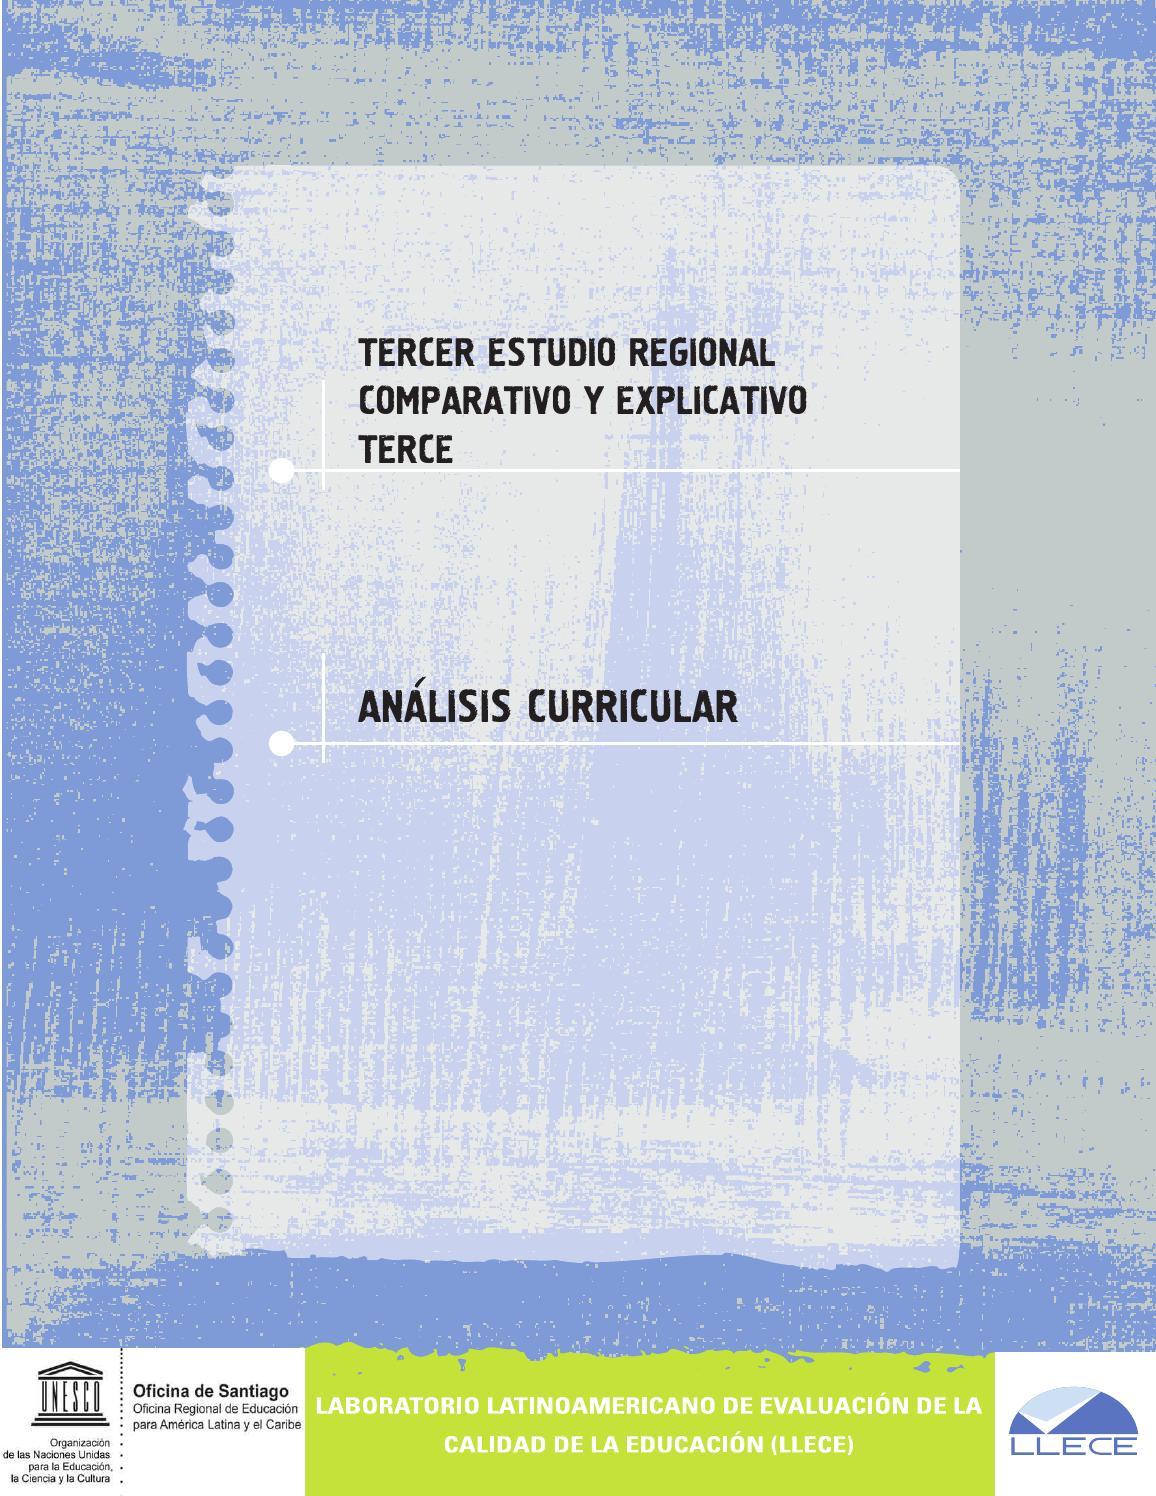 TERCE Análisis curricular by Jaime Espinoza Cruzado - issuu